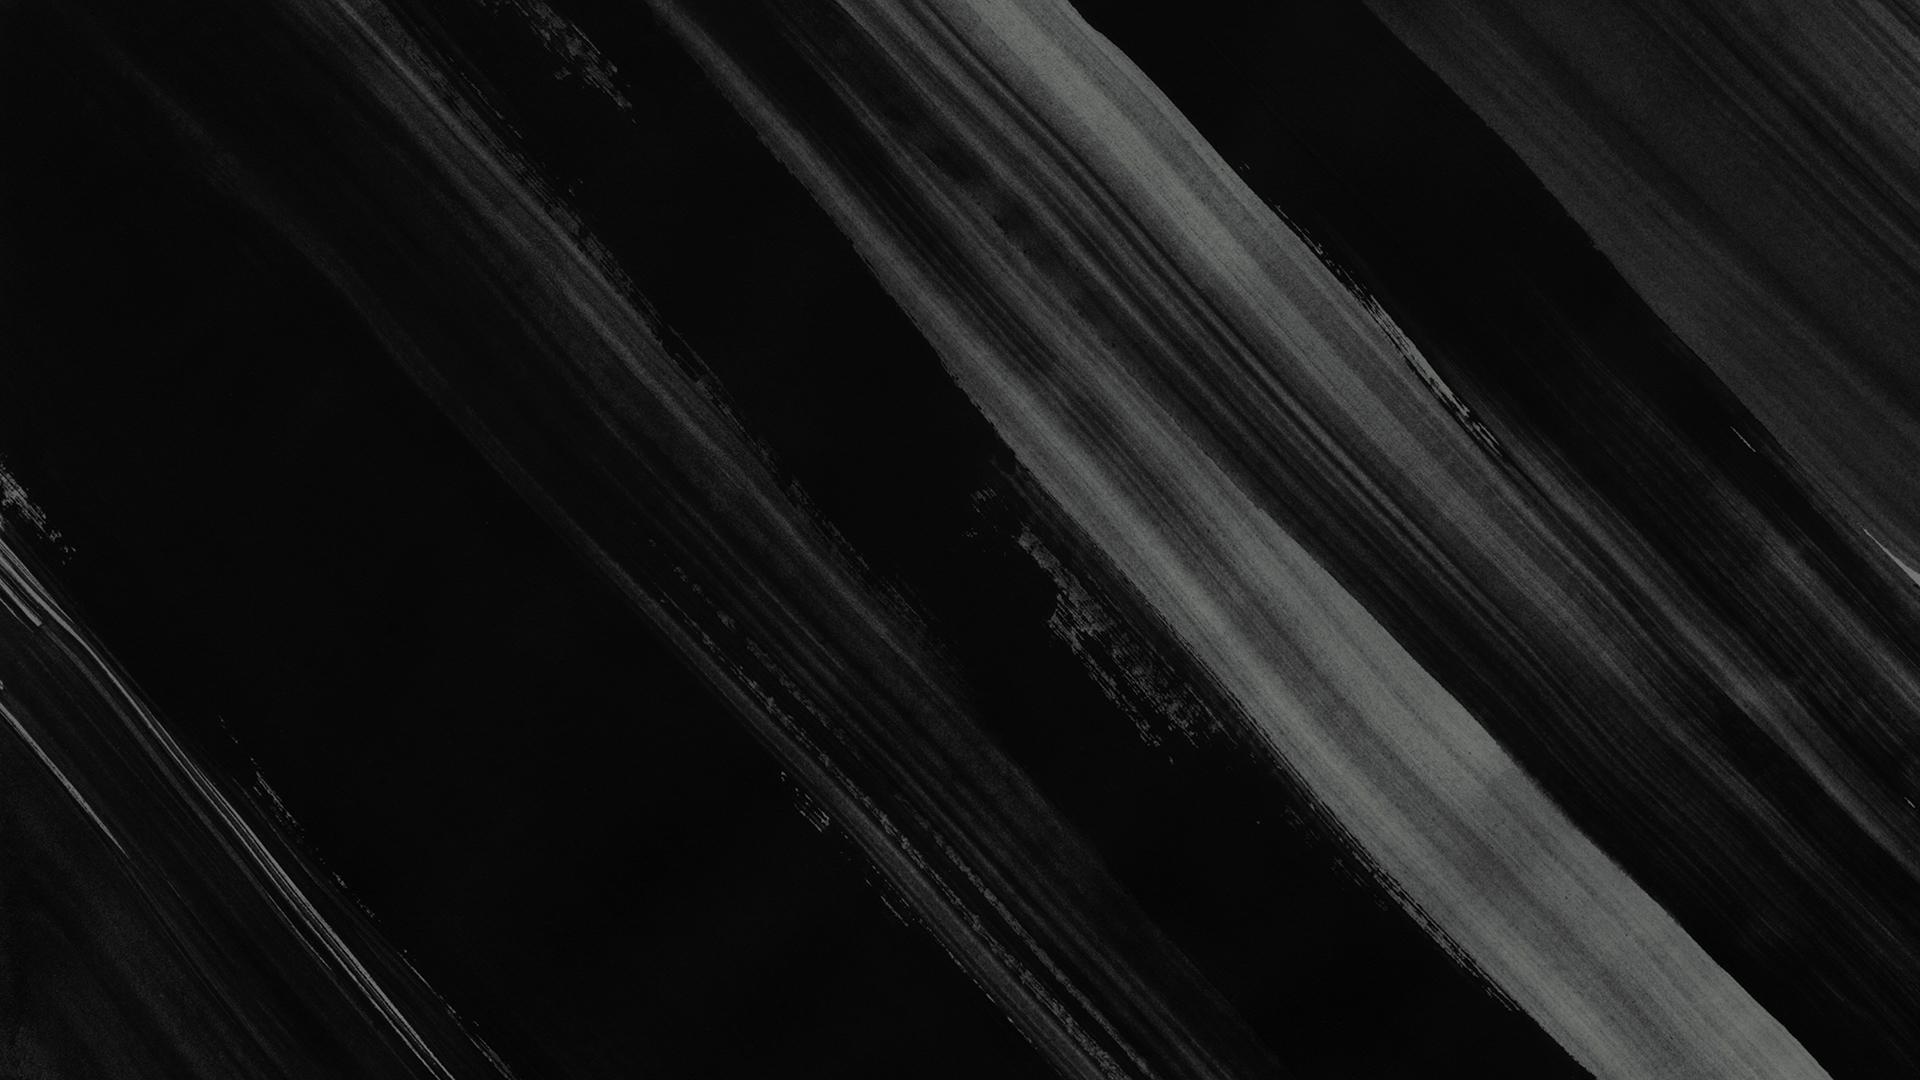 Google chrome os tan zerochan anime image board source : Painted Black Wallpaper For Chromebook, Pc or Mac - HD